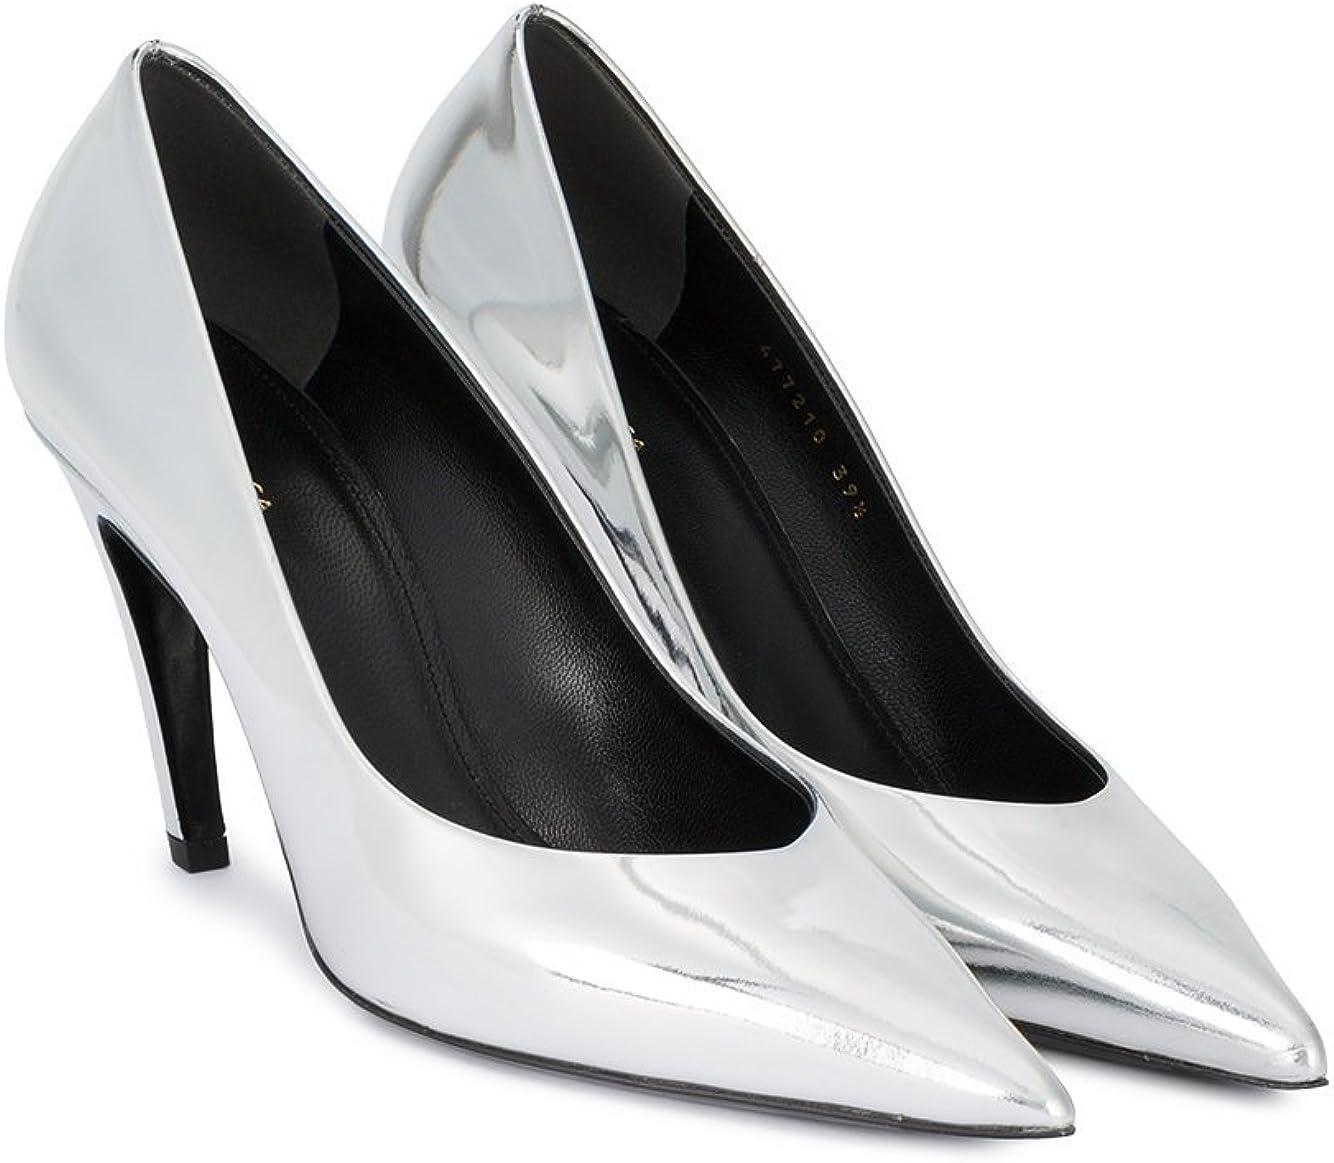 Balenciaga Damen 477210Wa0v08106 Silber Leder Pumps: Amazon